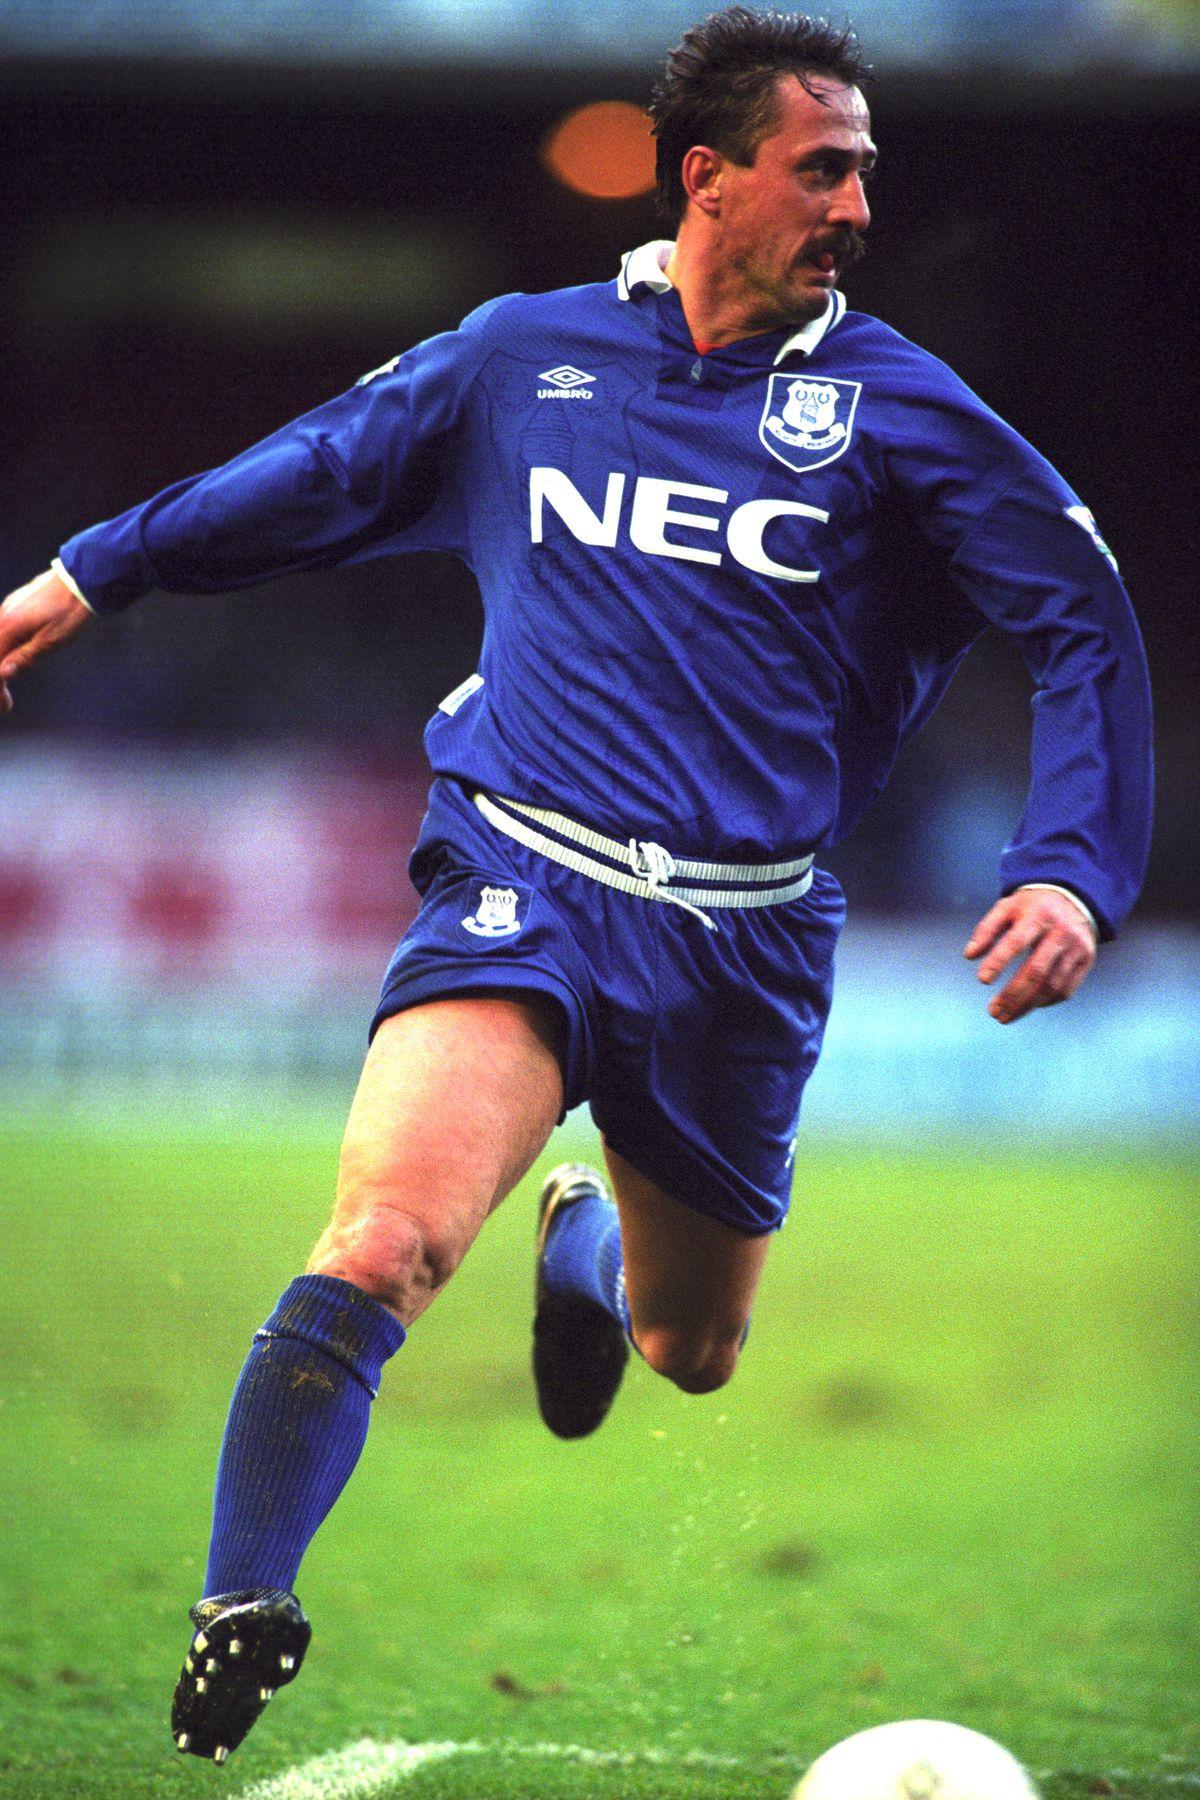 Soccer - FA Carling Premiership - Sheffield United v Everton - Bramall Lane